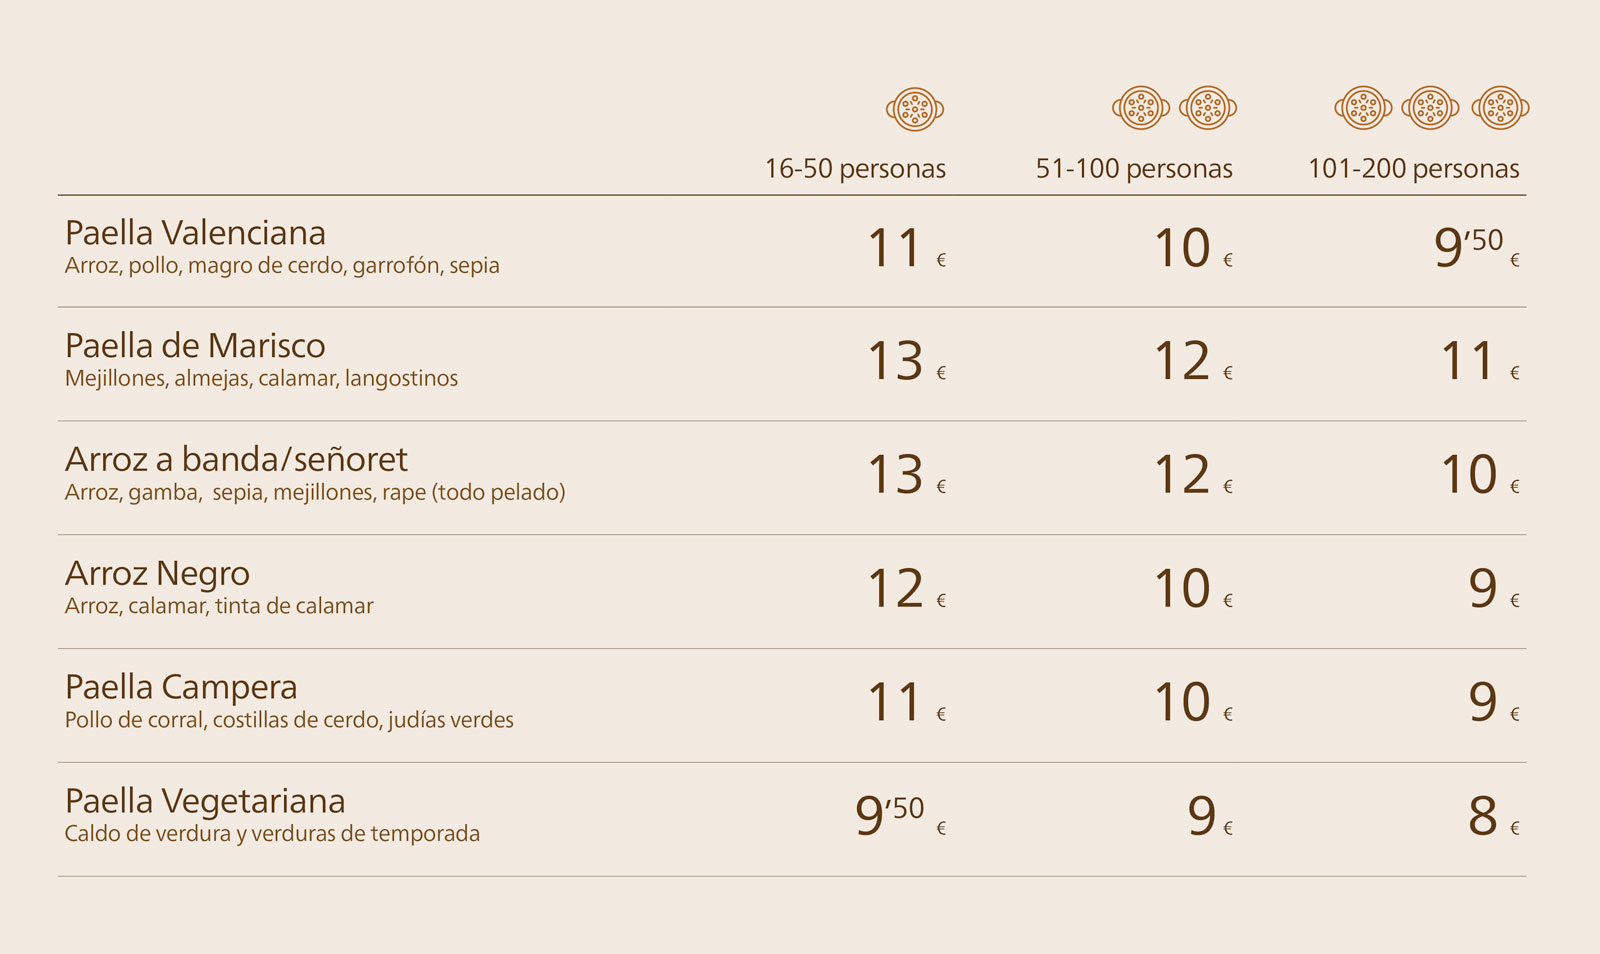 paellas-a-domicilio-madrid-precios-oct-2017